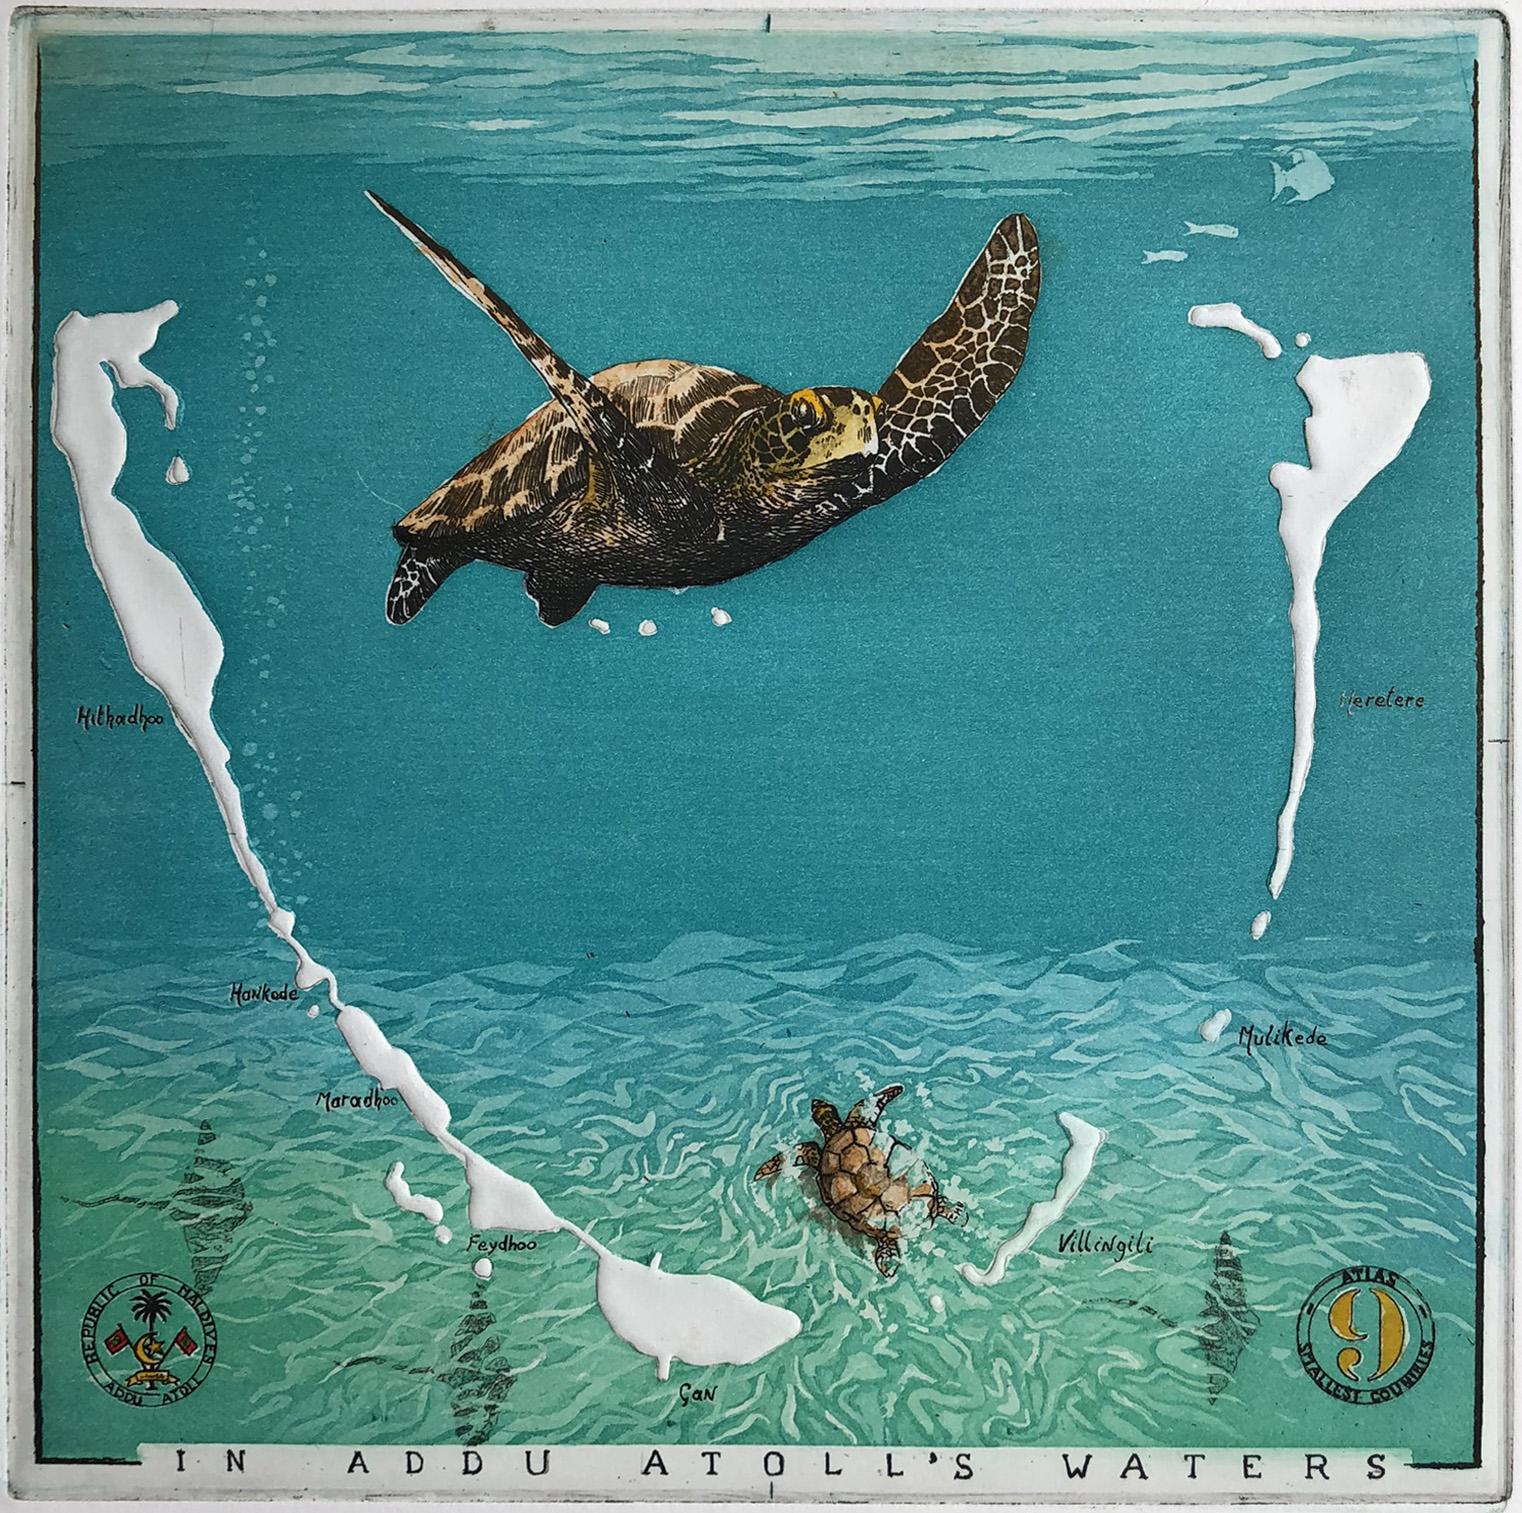 In Addu Atolls Waters